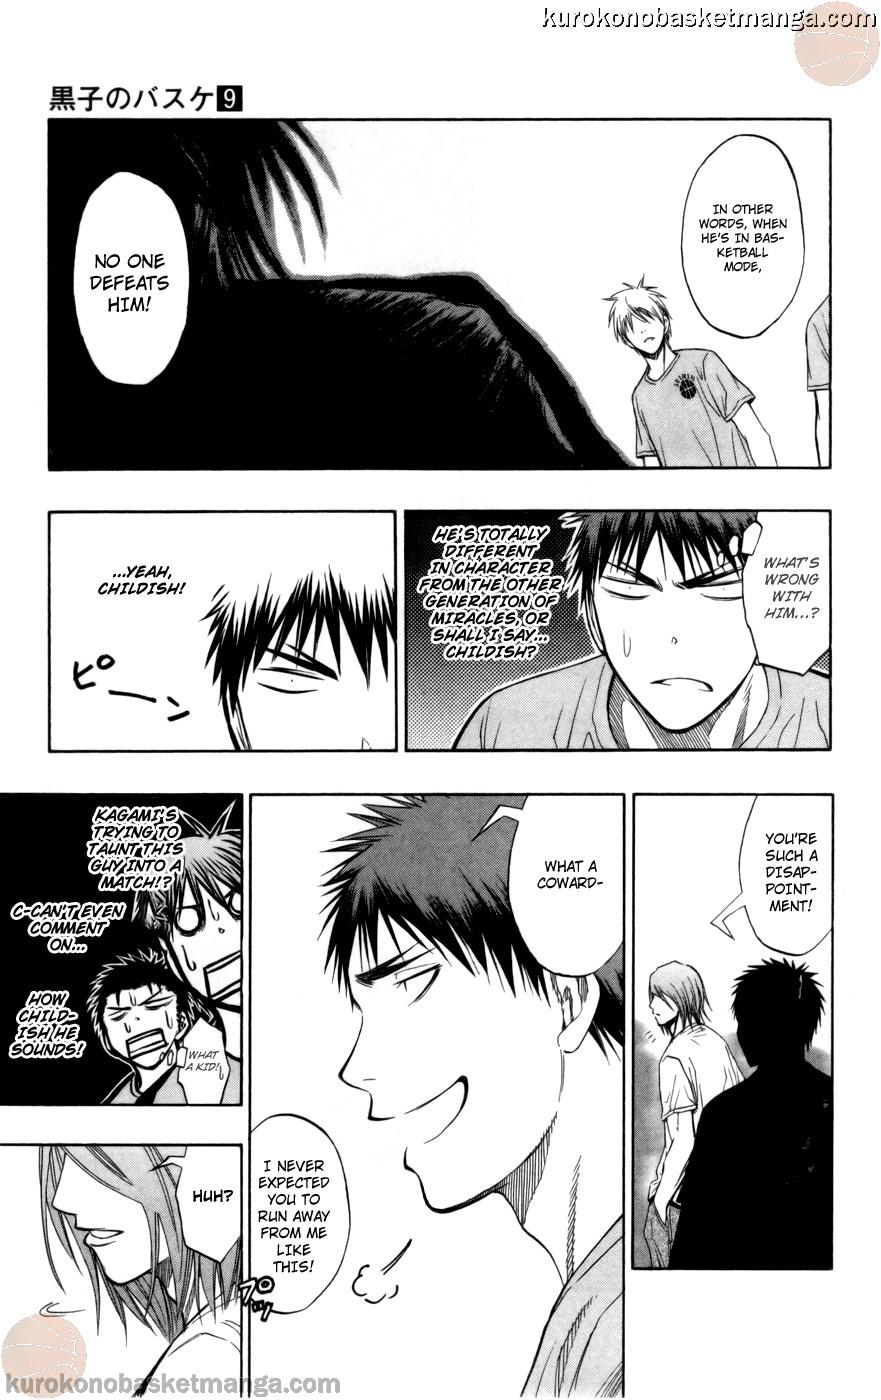 Kuroko no Basket Manga Chapter 78 - Image 09